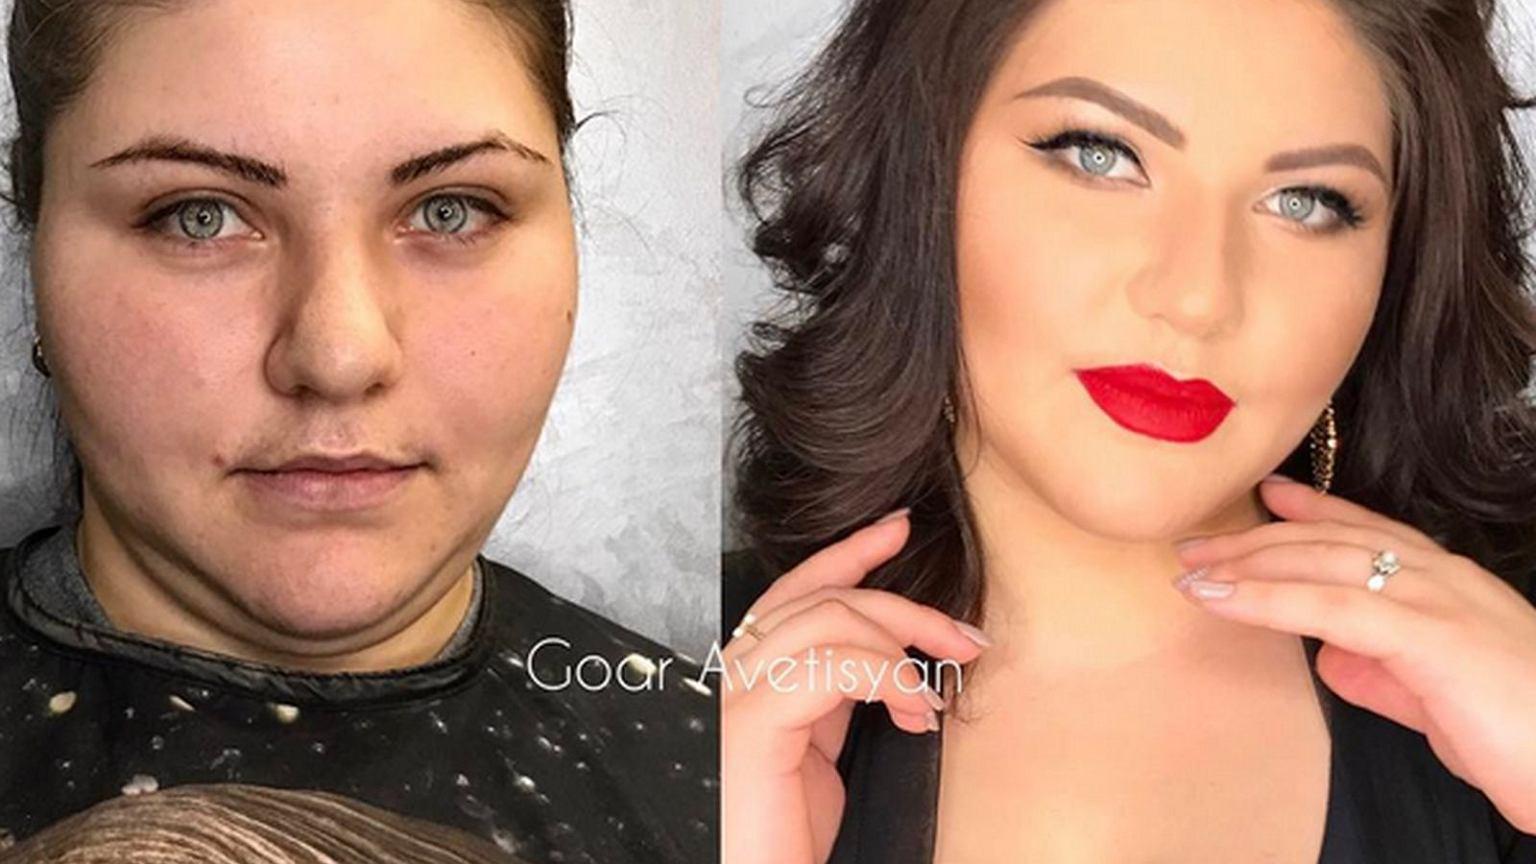 Модель для макияжа у гоар аветисян